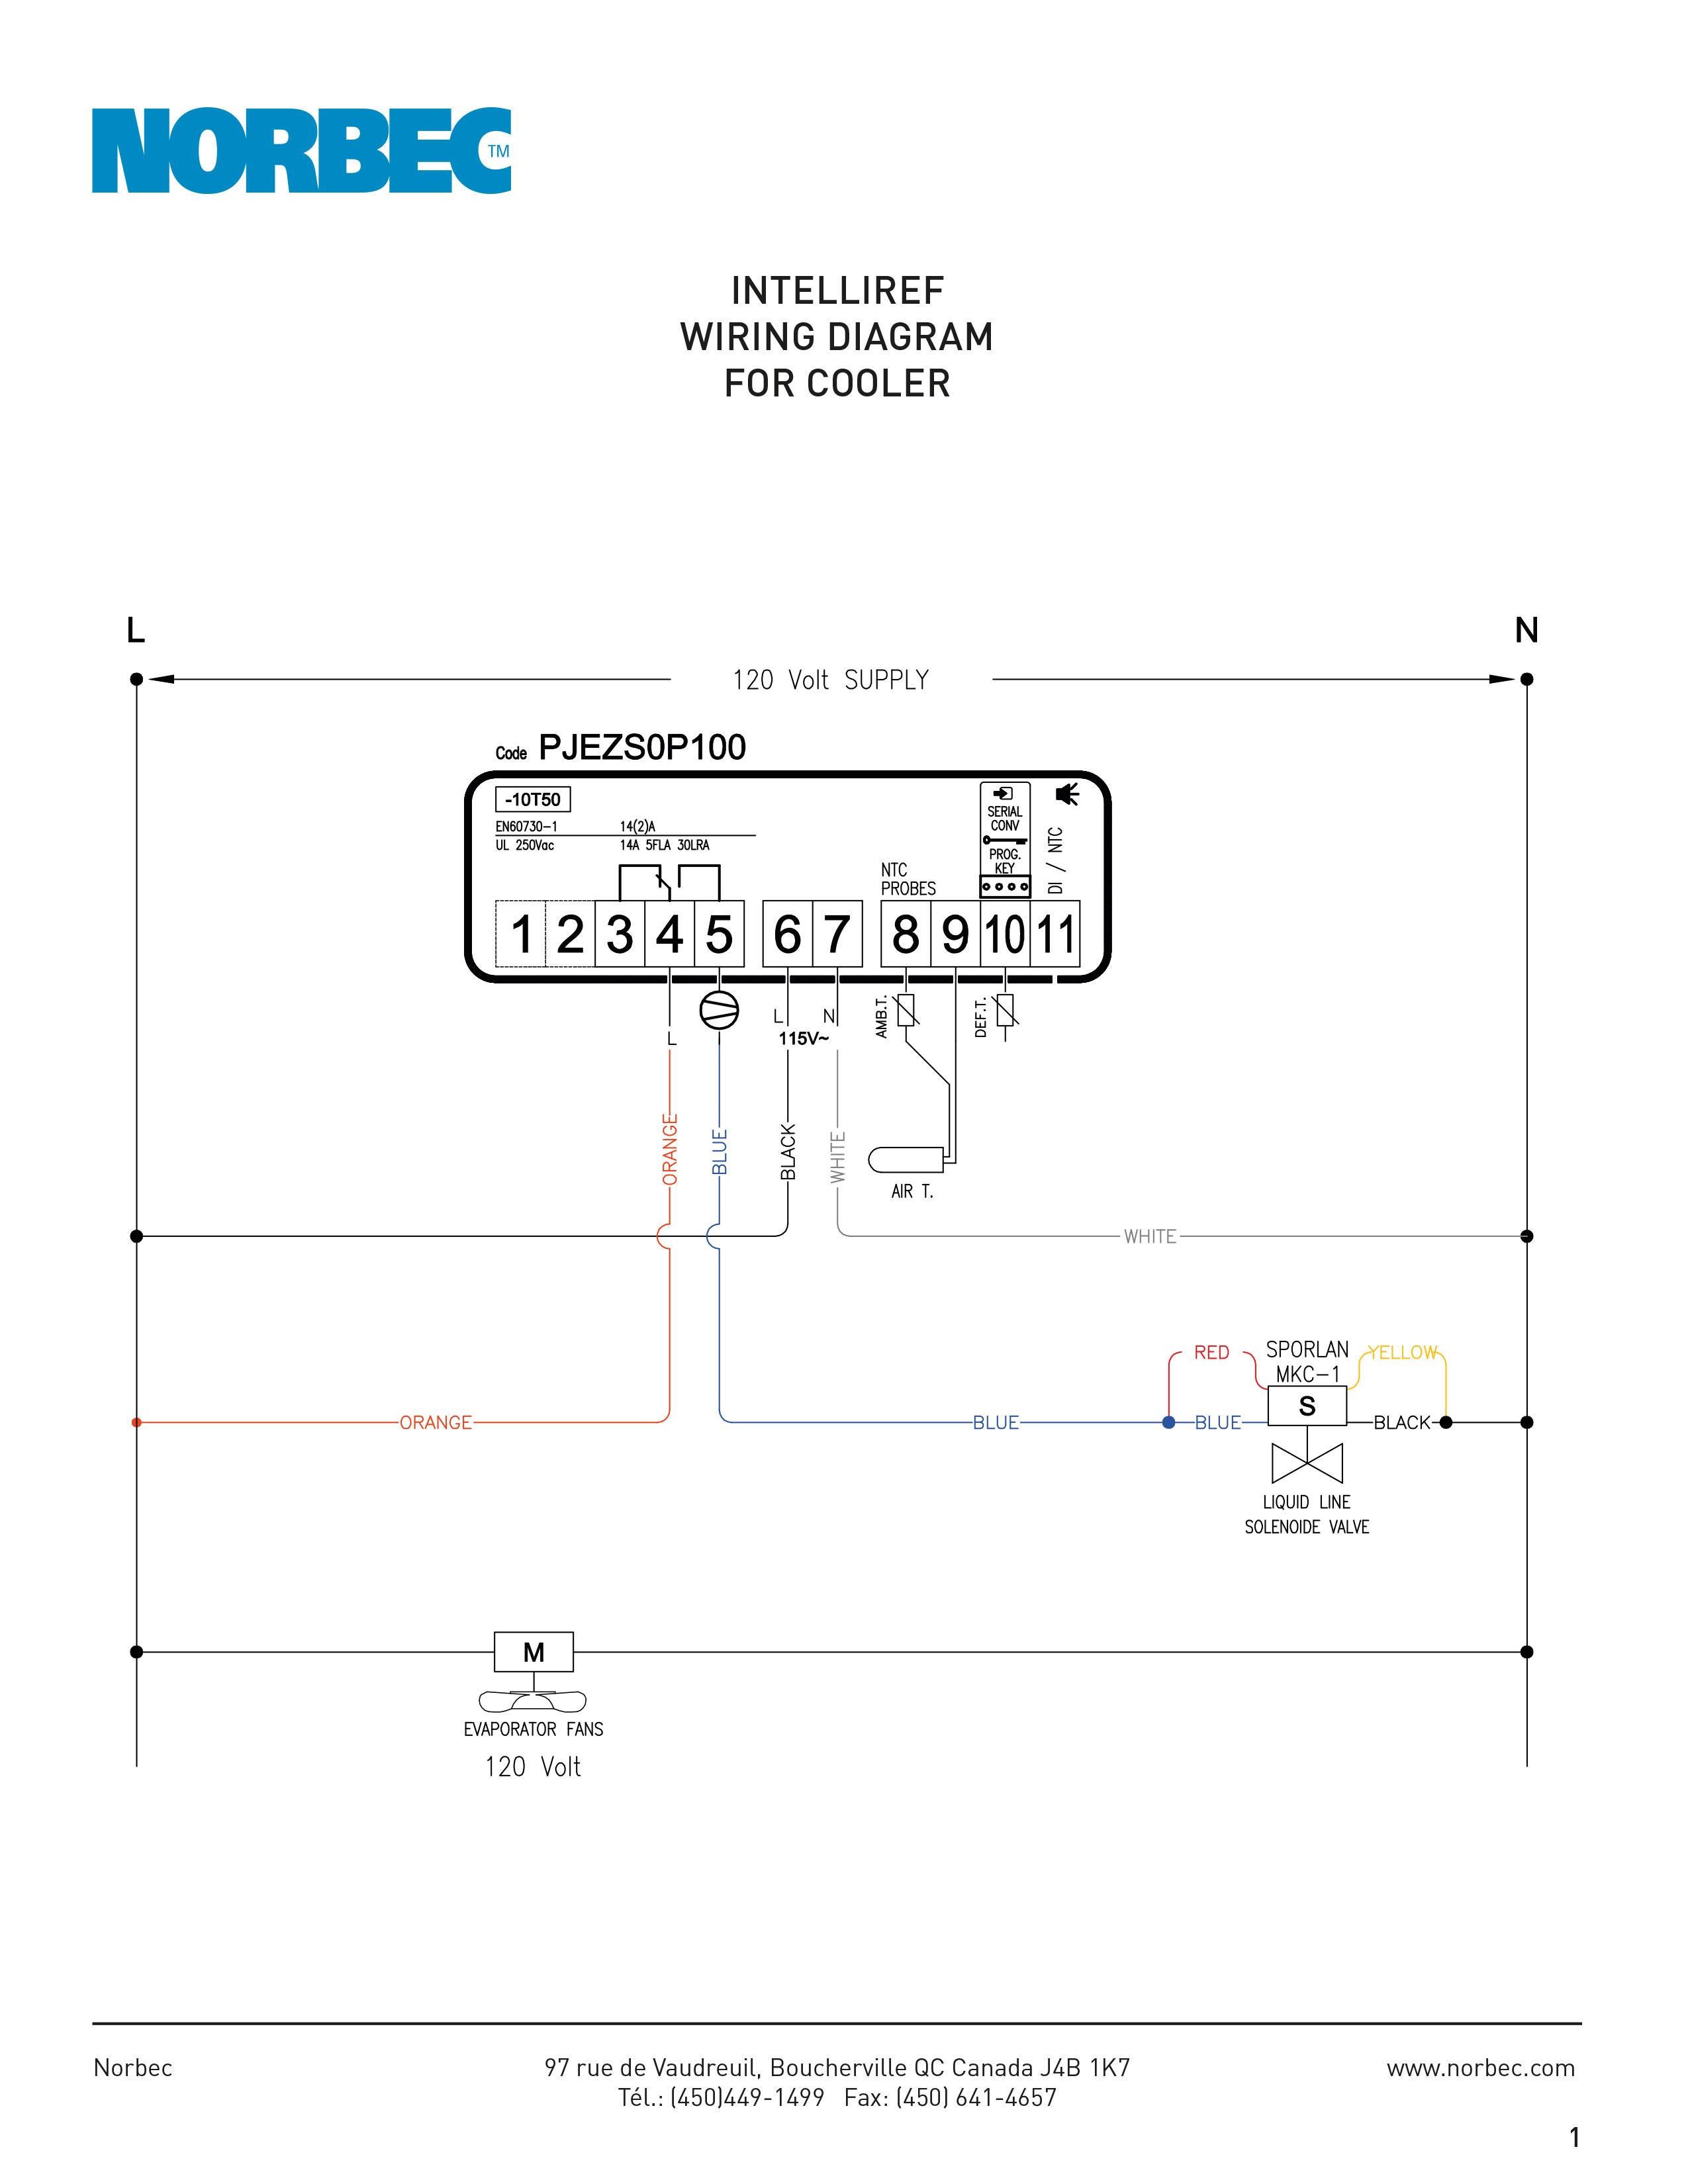 Intelliref - Wiring Diagrams